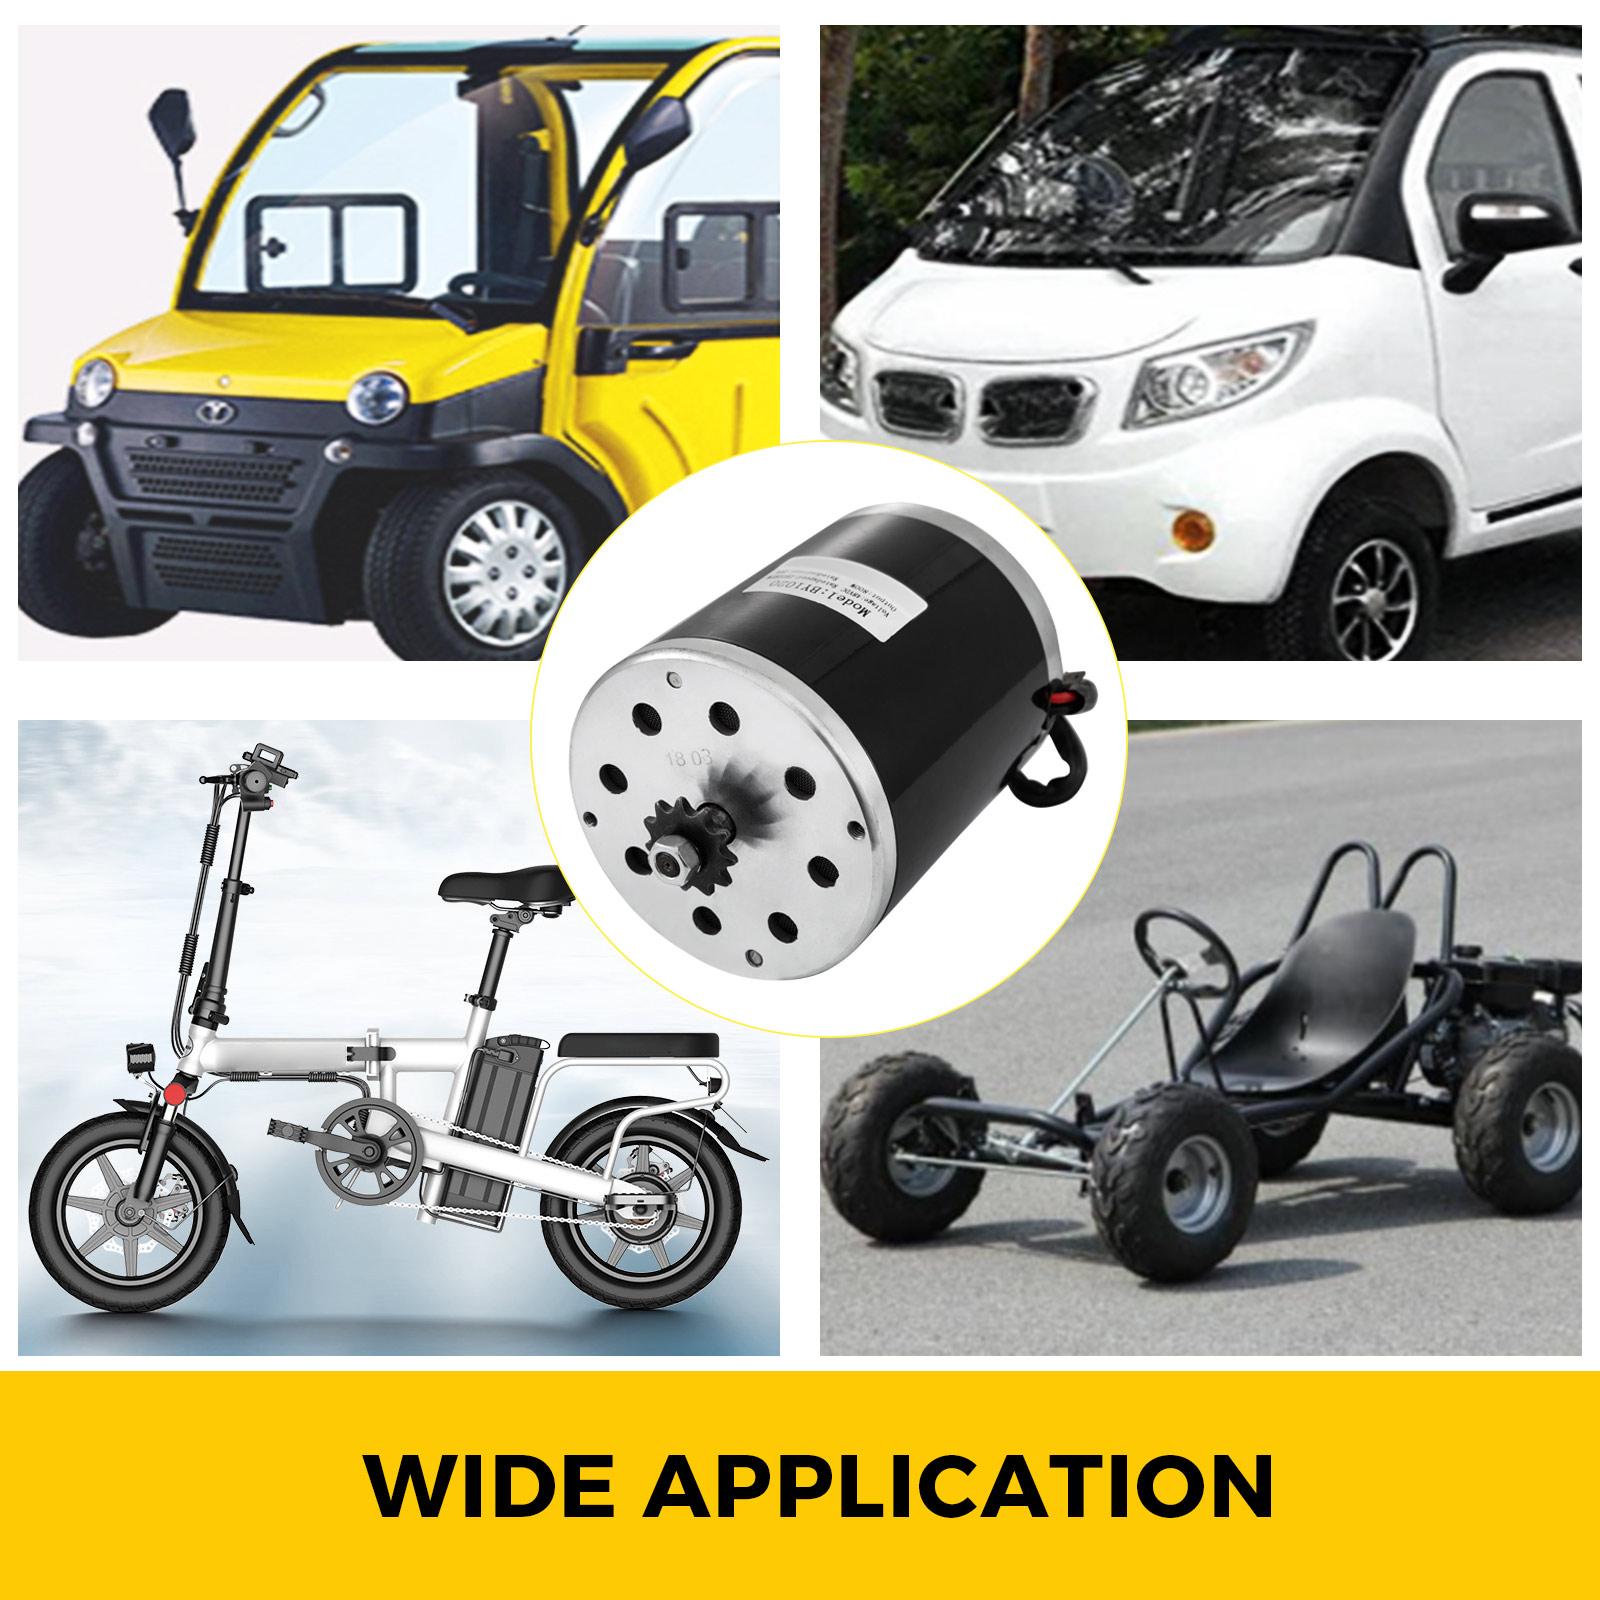 DC-electric-motor-12-60V-150W-2KW-for-scooter-bike-go-kart-minibike-e-ATV thumbnail 139